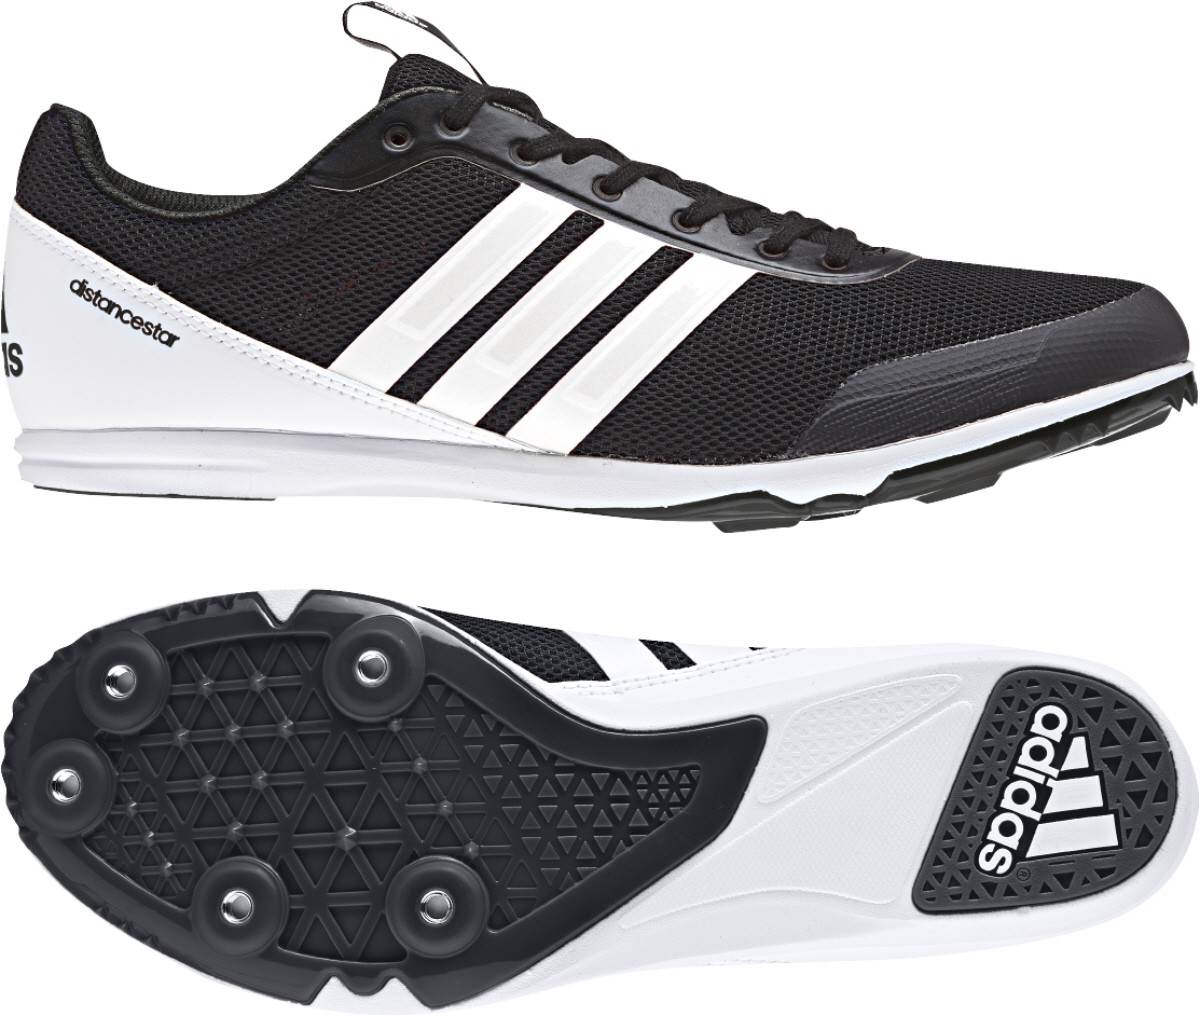 separation shoes bb607 bd3ec adidas distancestar w Damen Spikes Spike Schuhe  KLEES - Exklusive  Sportmarken zu fairen Outletpreisen